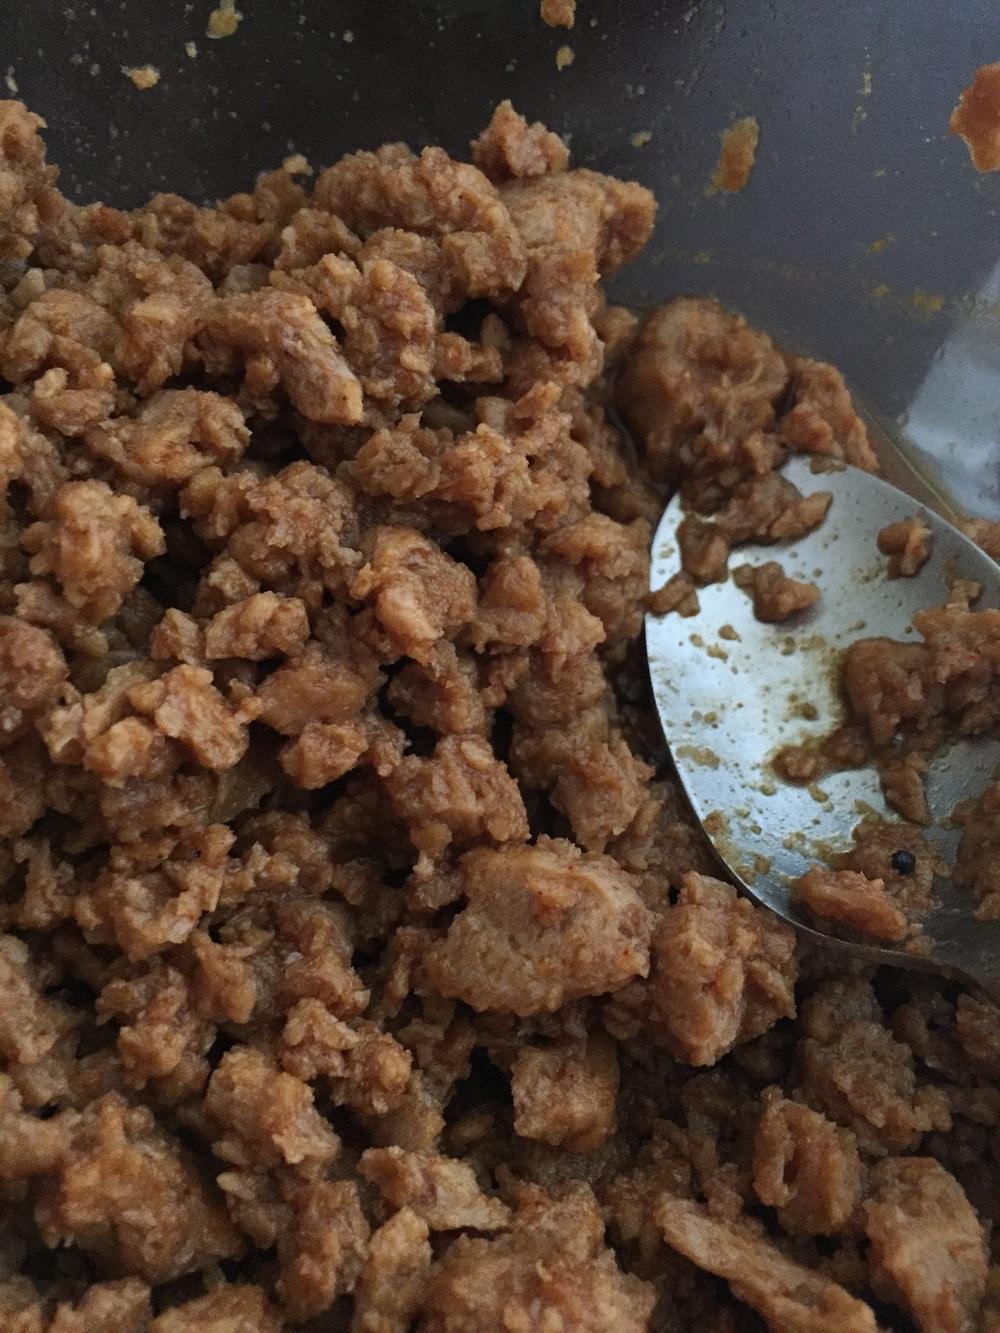 Tasty enough to please picky (read:omnivorous) tastebuds!